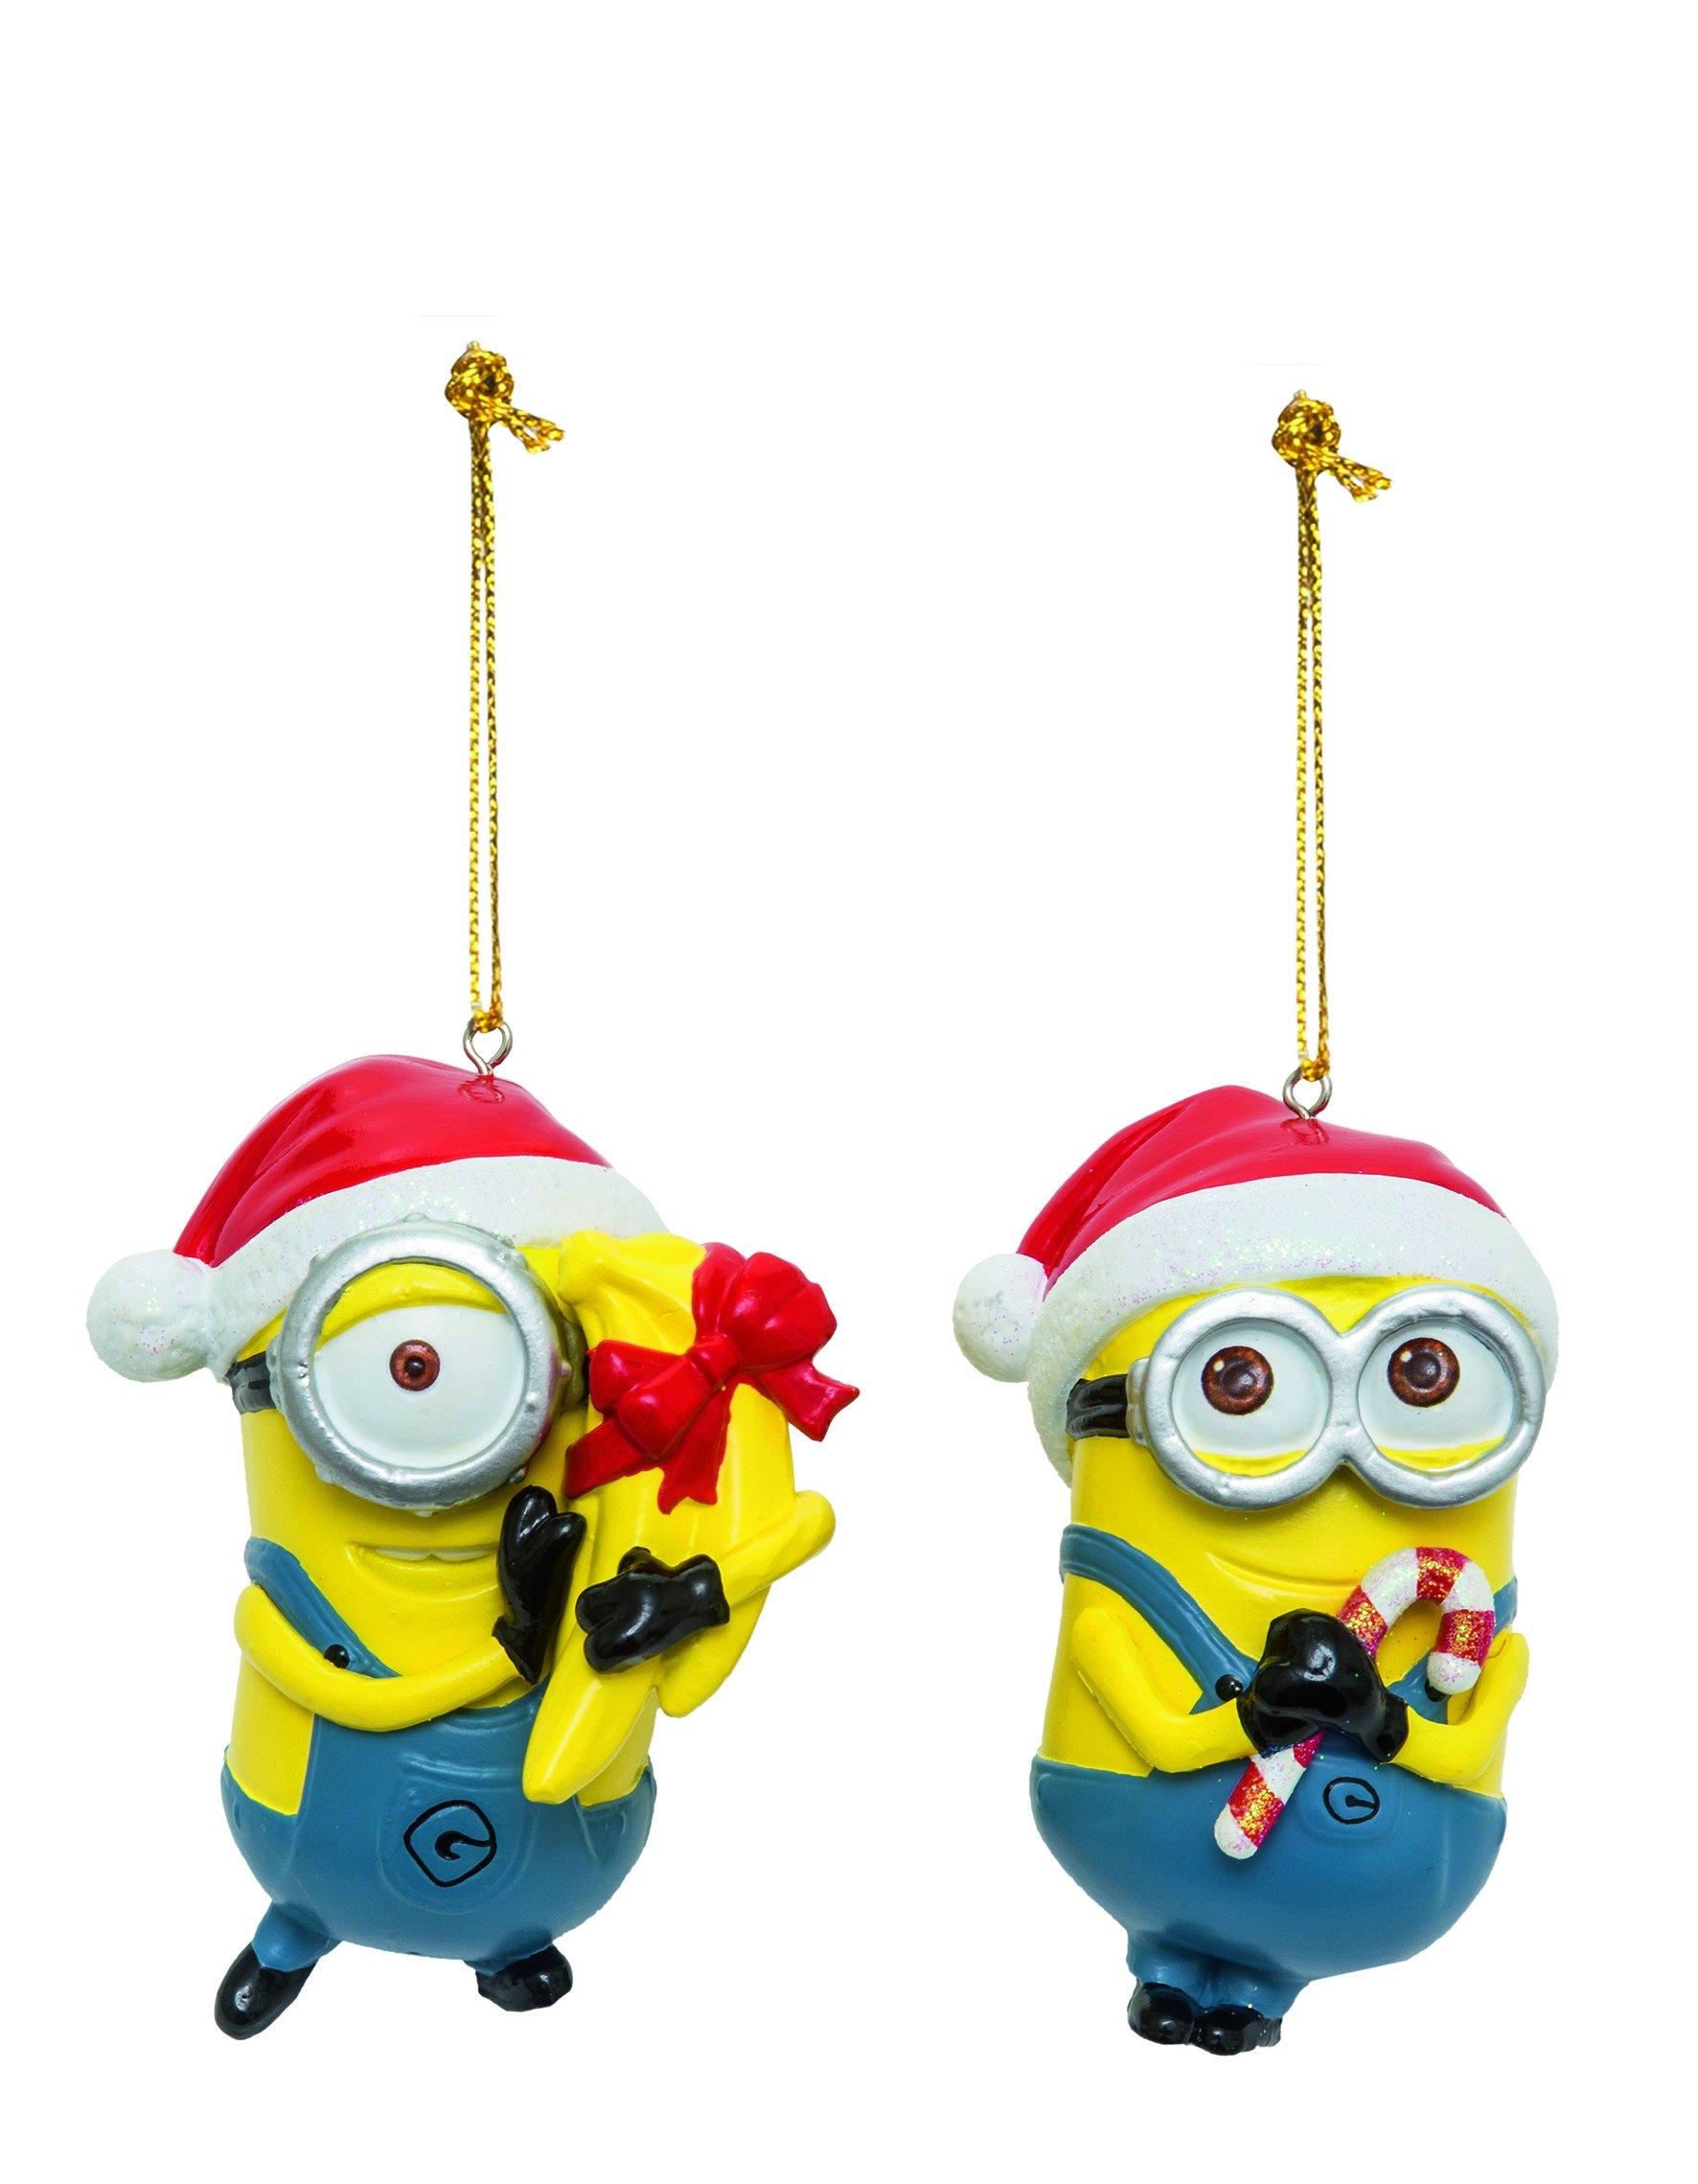 Minions Christmas Ornaments - rjmovers.com